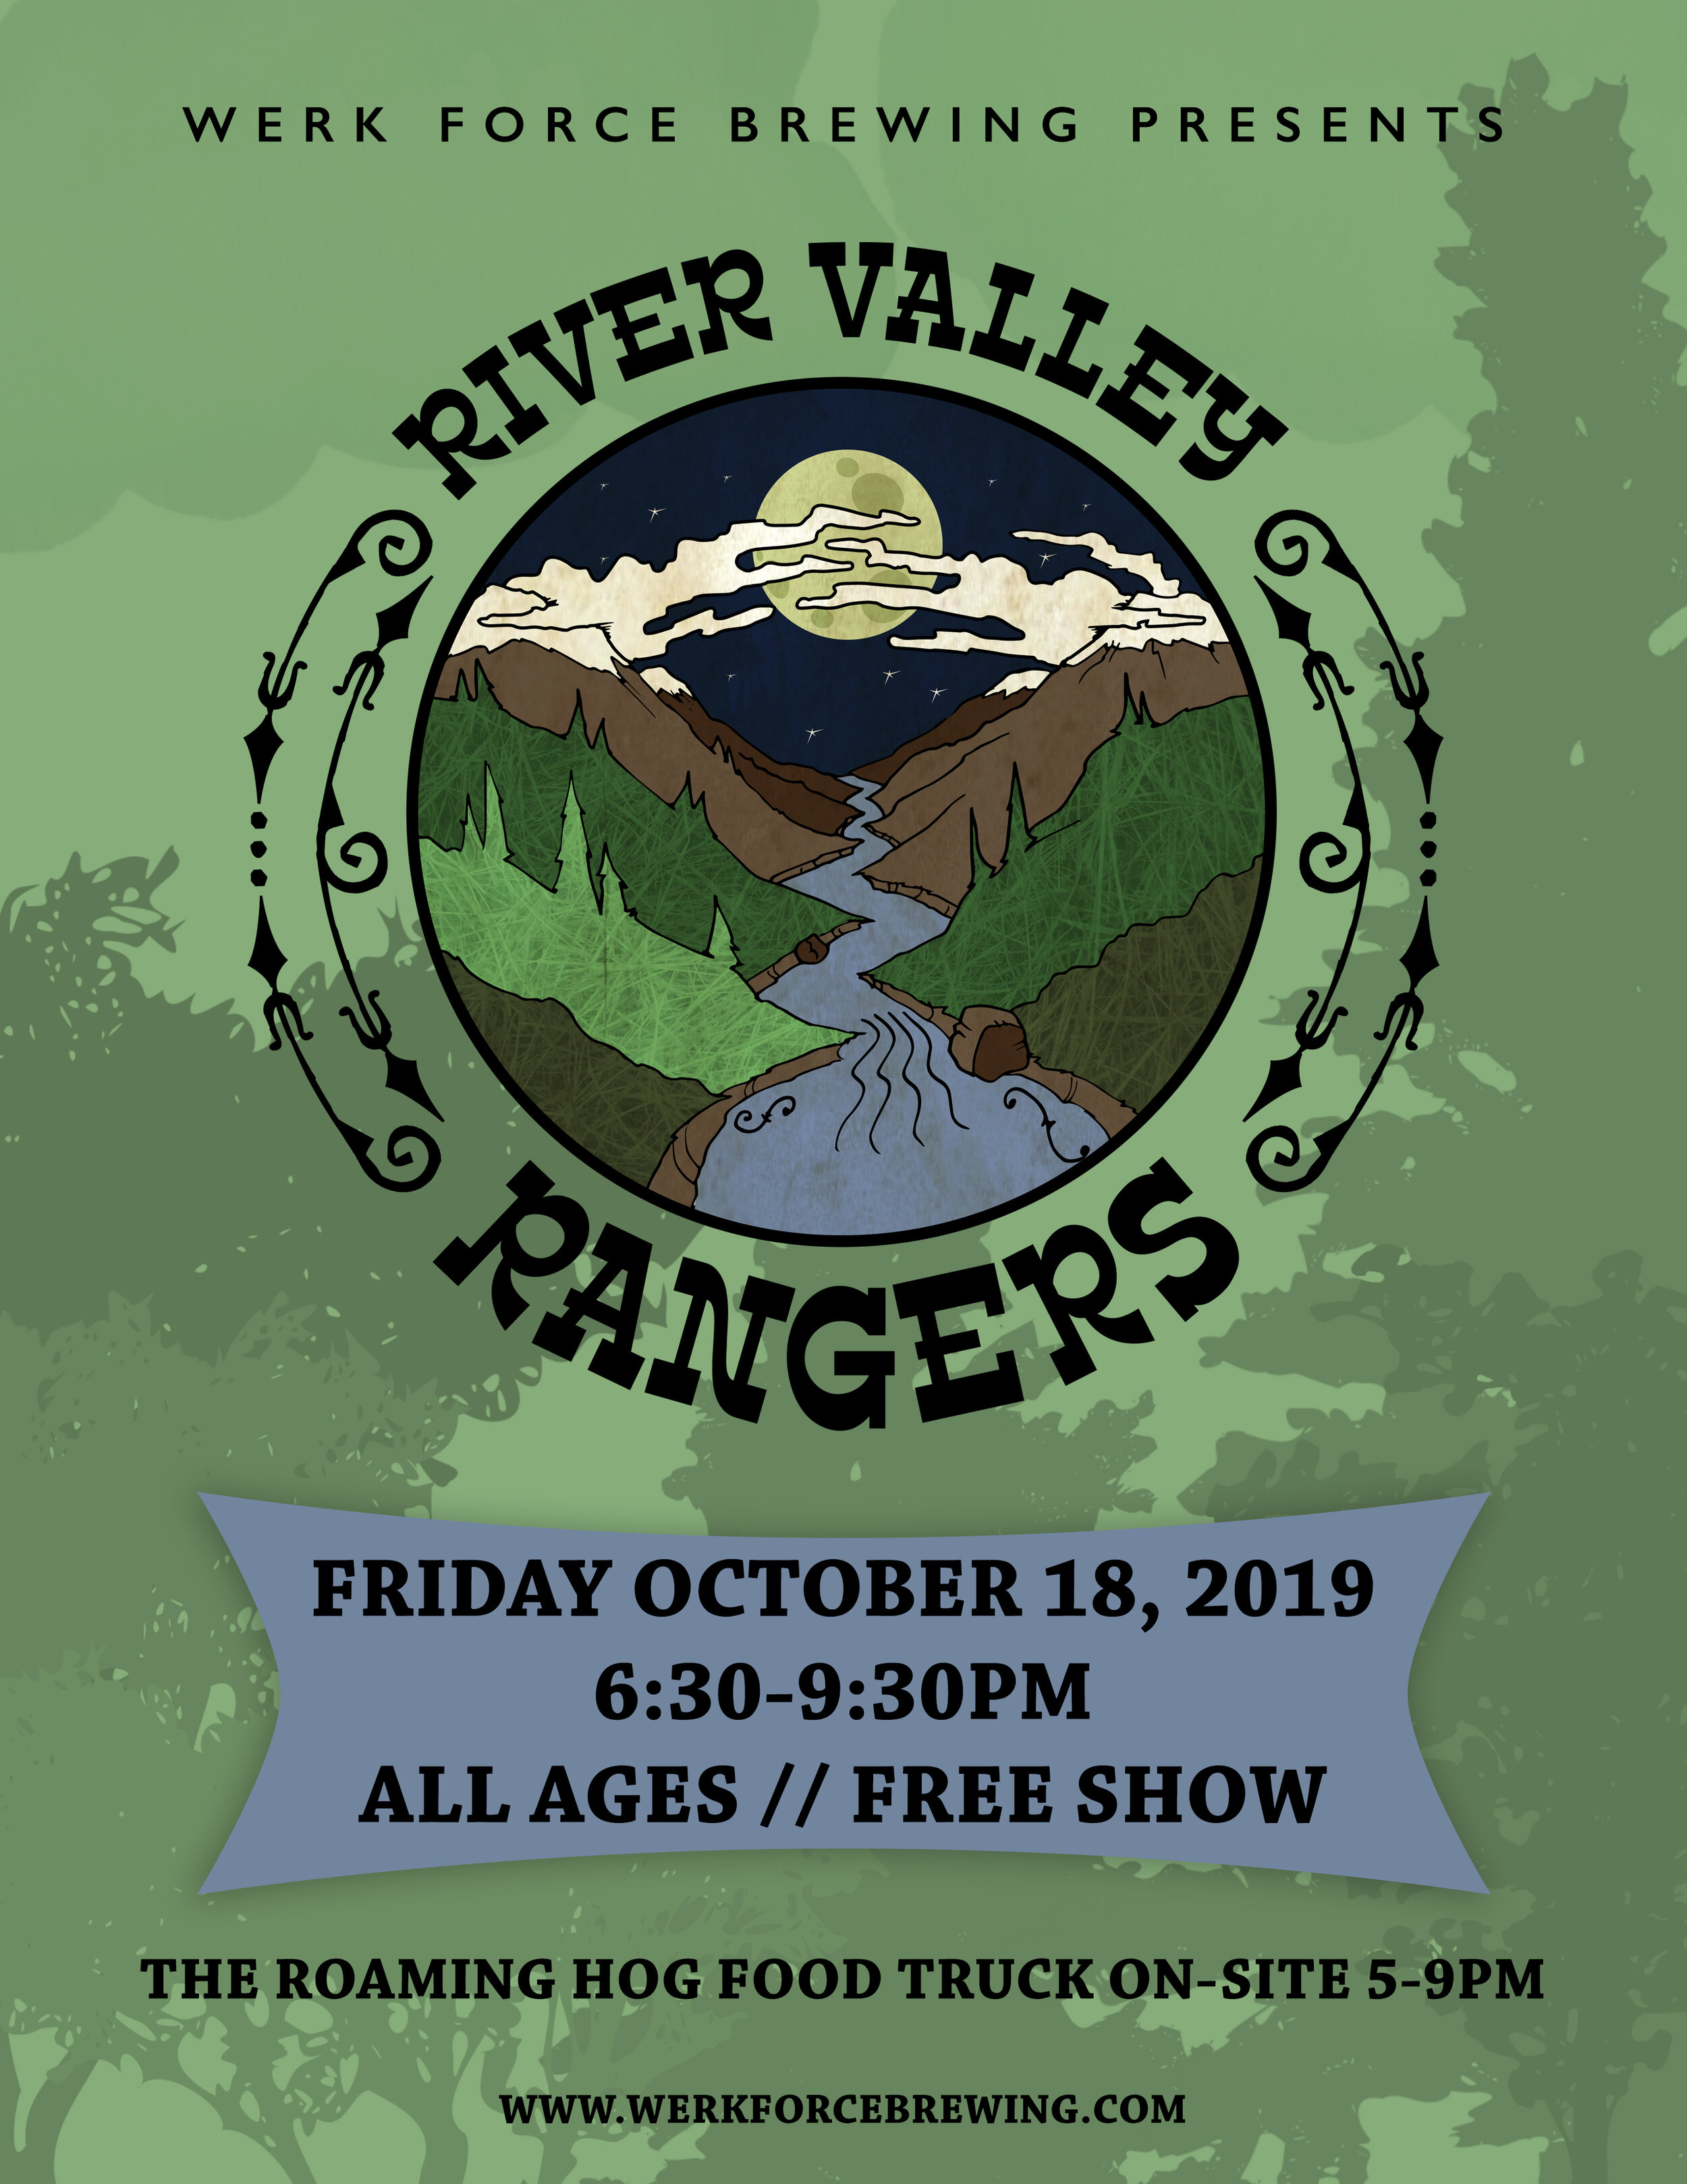 RiverValleyRangers.jpg